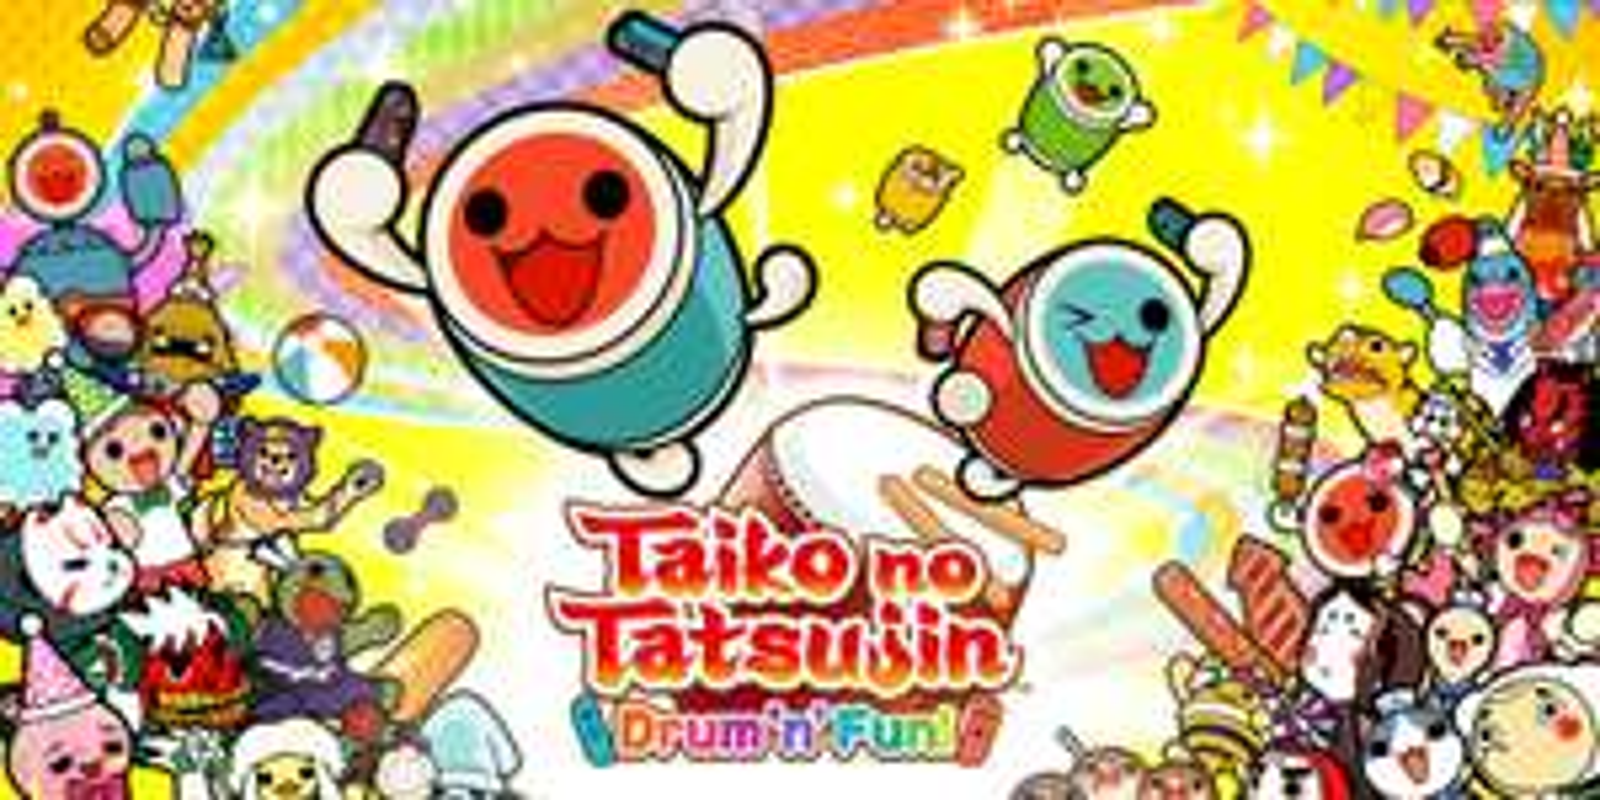 Taiko no Tatsujin: Drum 'n' Fun! Nintendo Switch (US eShop)